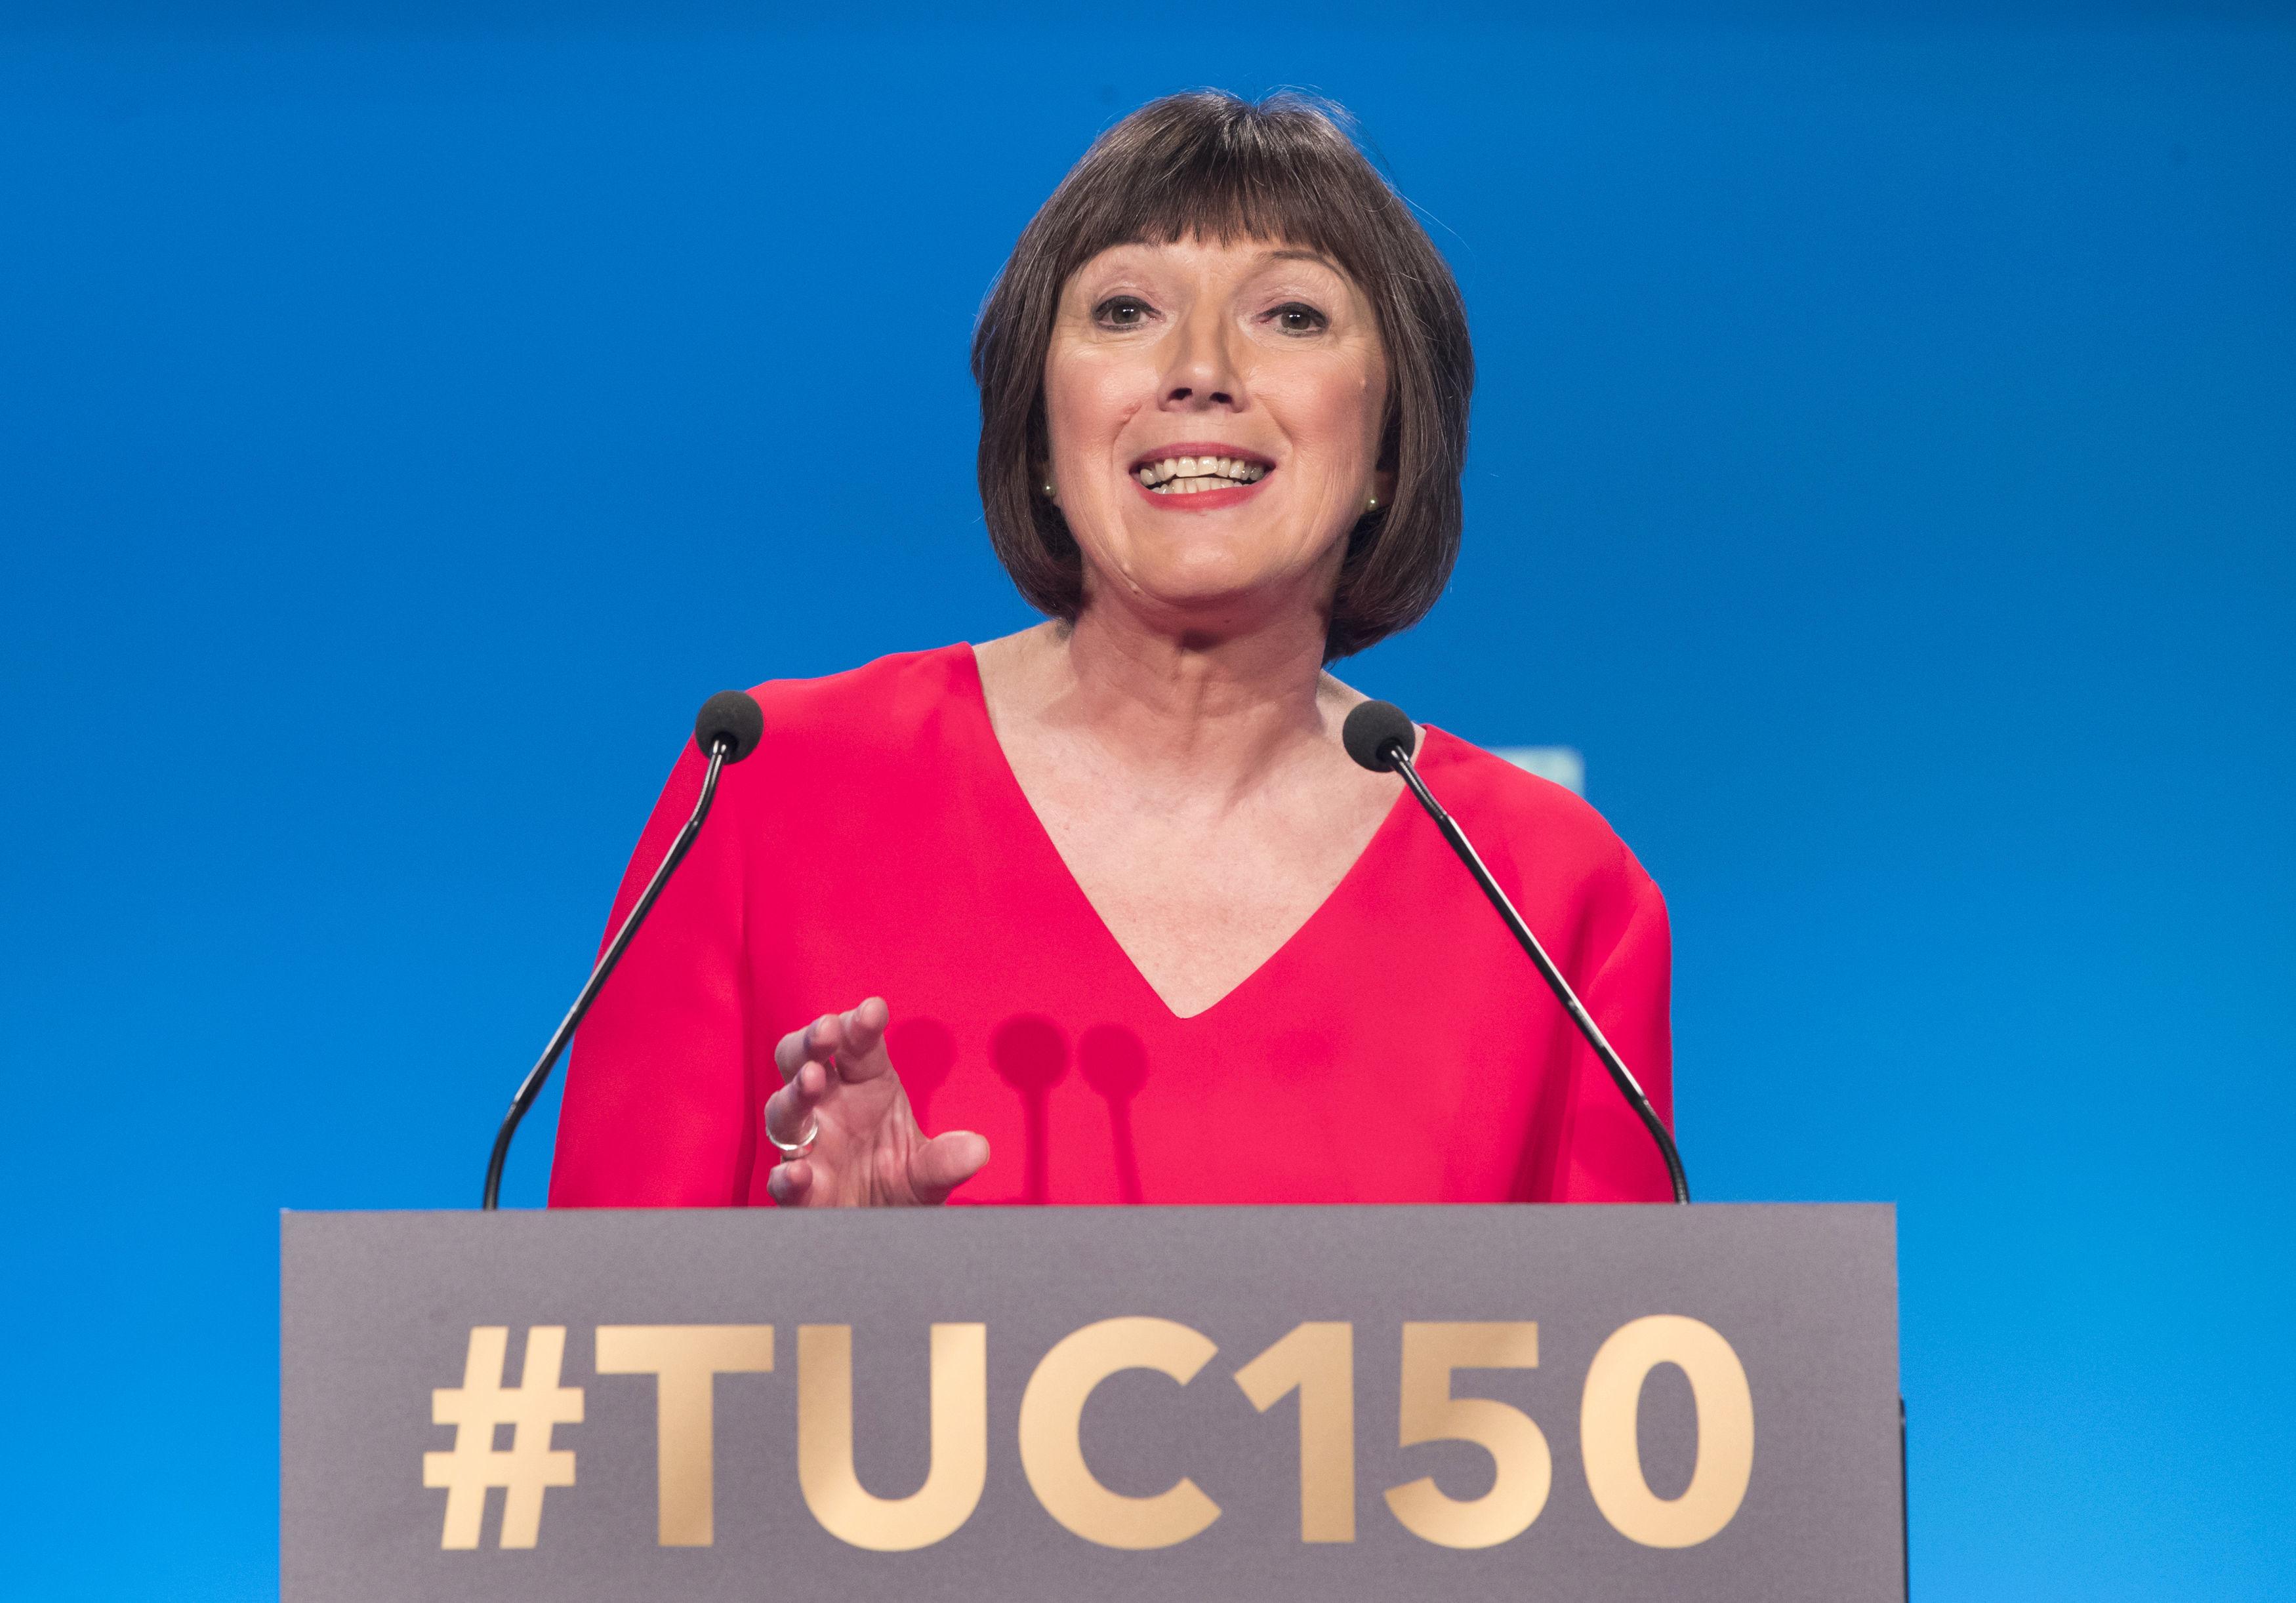 Frances O'Grady of the TUC. Credit: PA